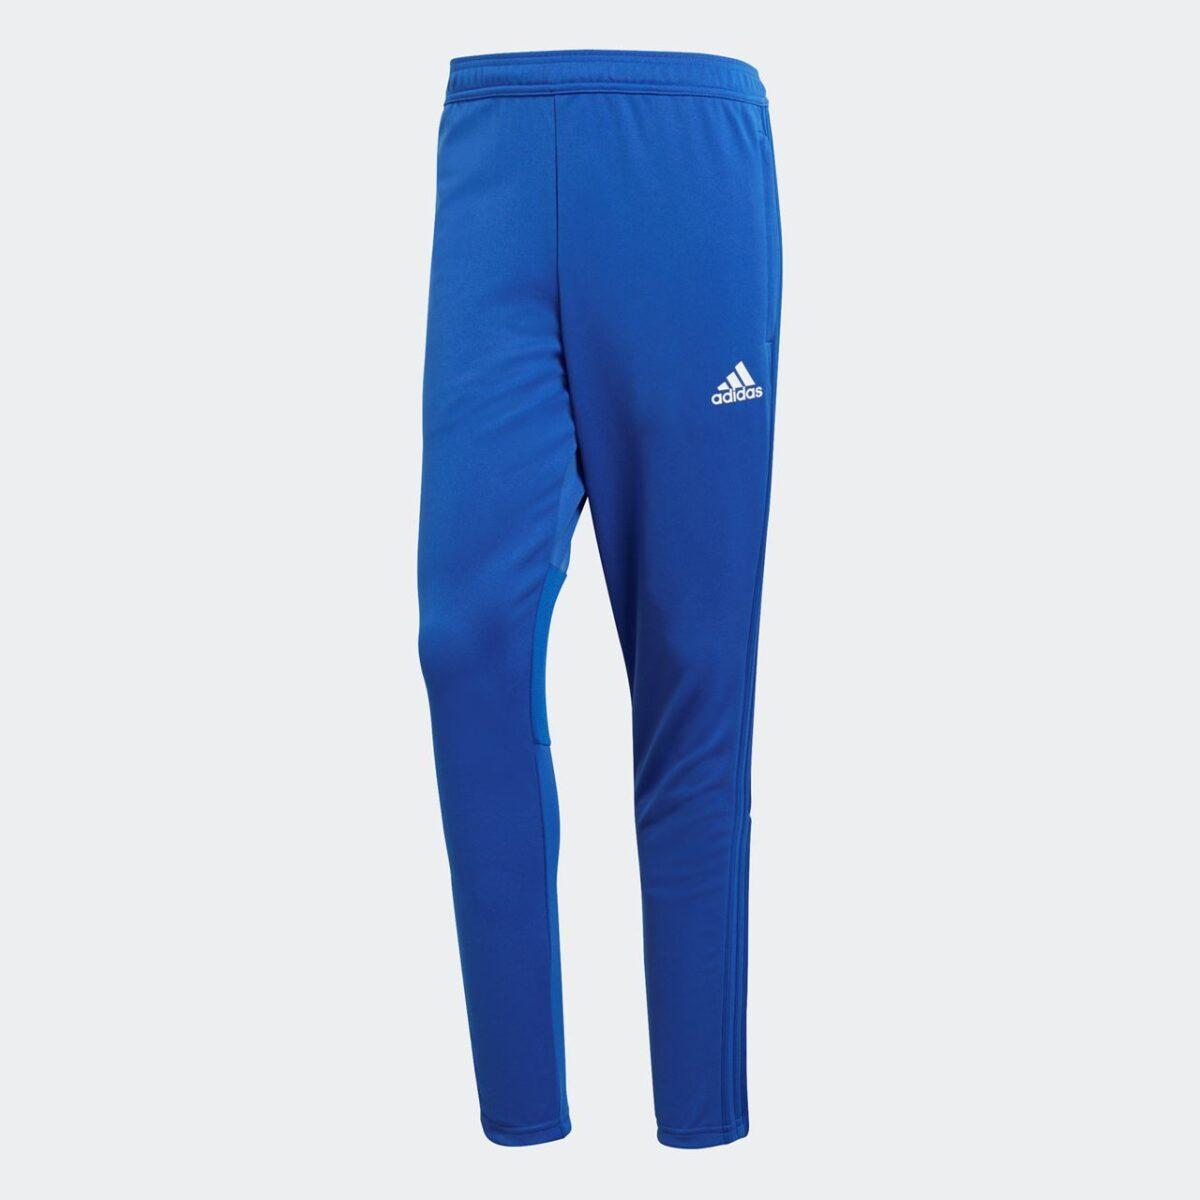 Adidas Condivo 18 Training Pant Adult